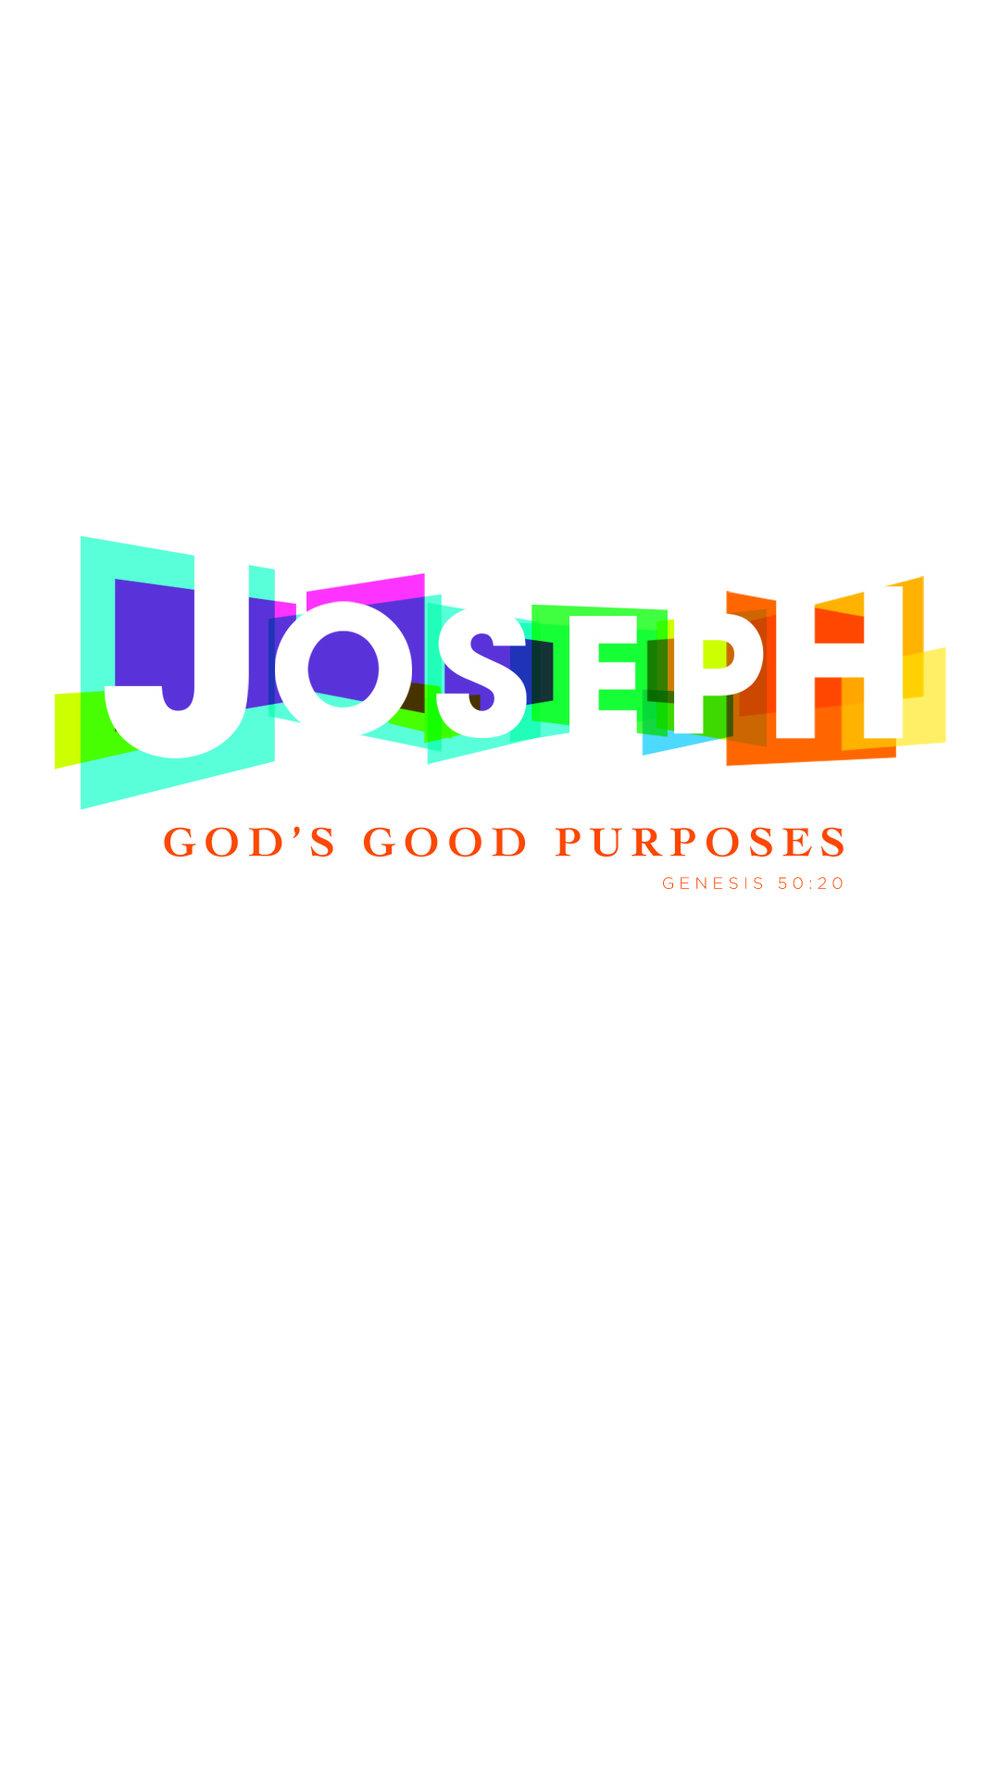 Joseph Phone Wallpaper.jpg